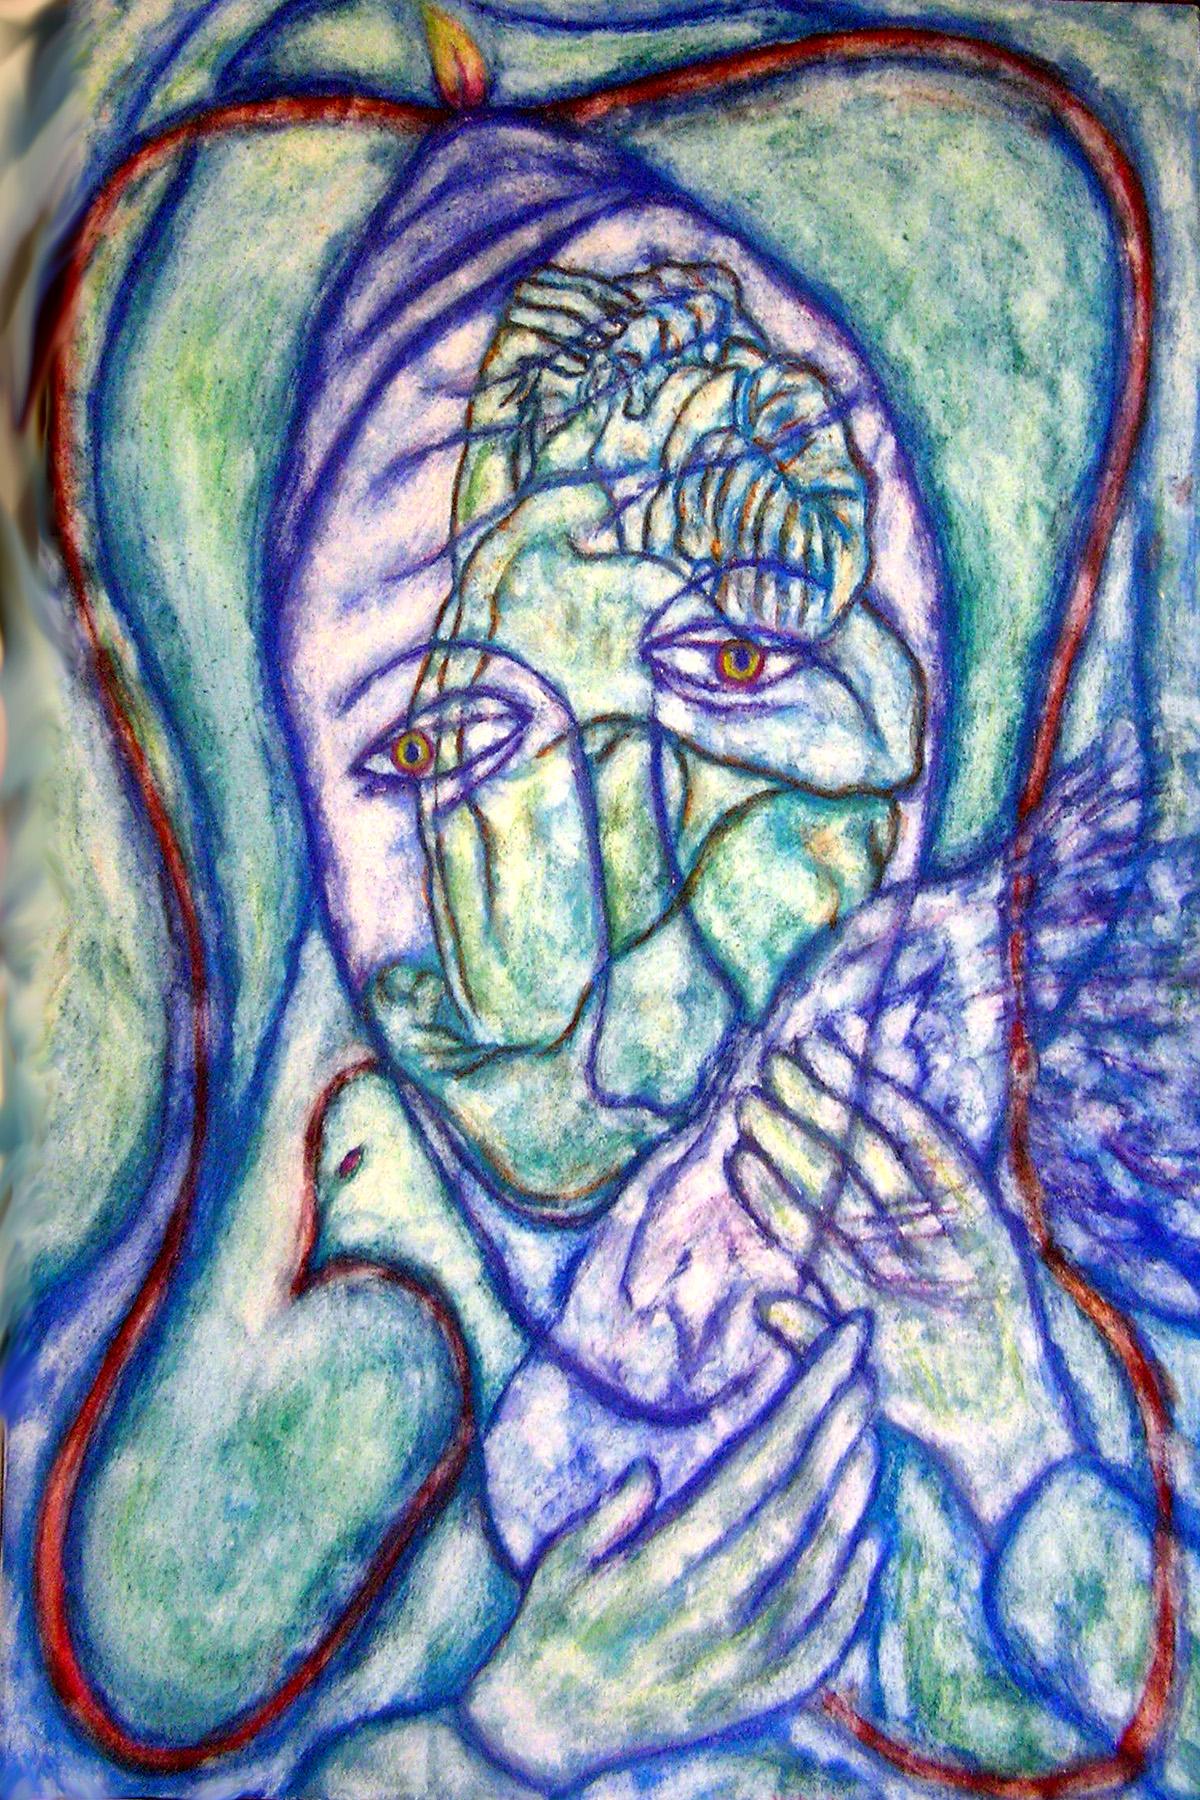 Stephen Mead Artwork 'HeartLikeMarys', 1996. Watercolor. Healing. Artist Description: Evocative spiritual piece inspired, in part, by Joni Mitchell' s